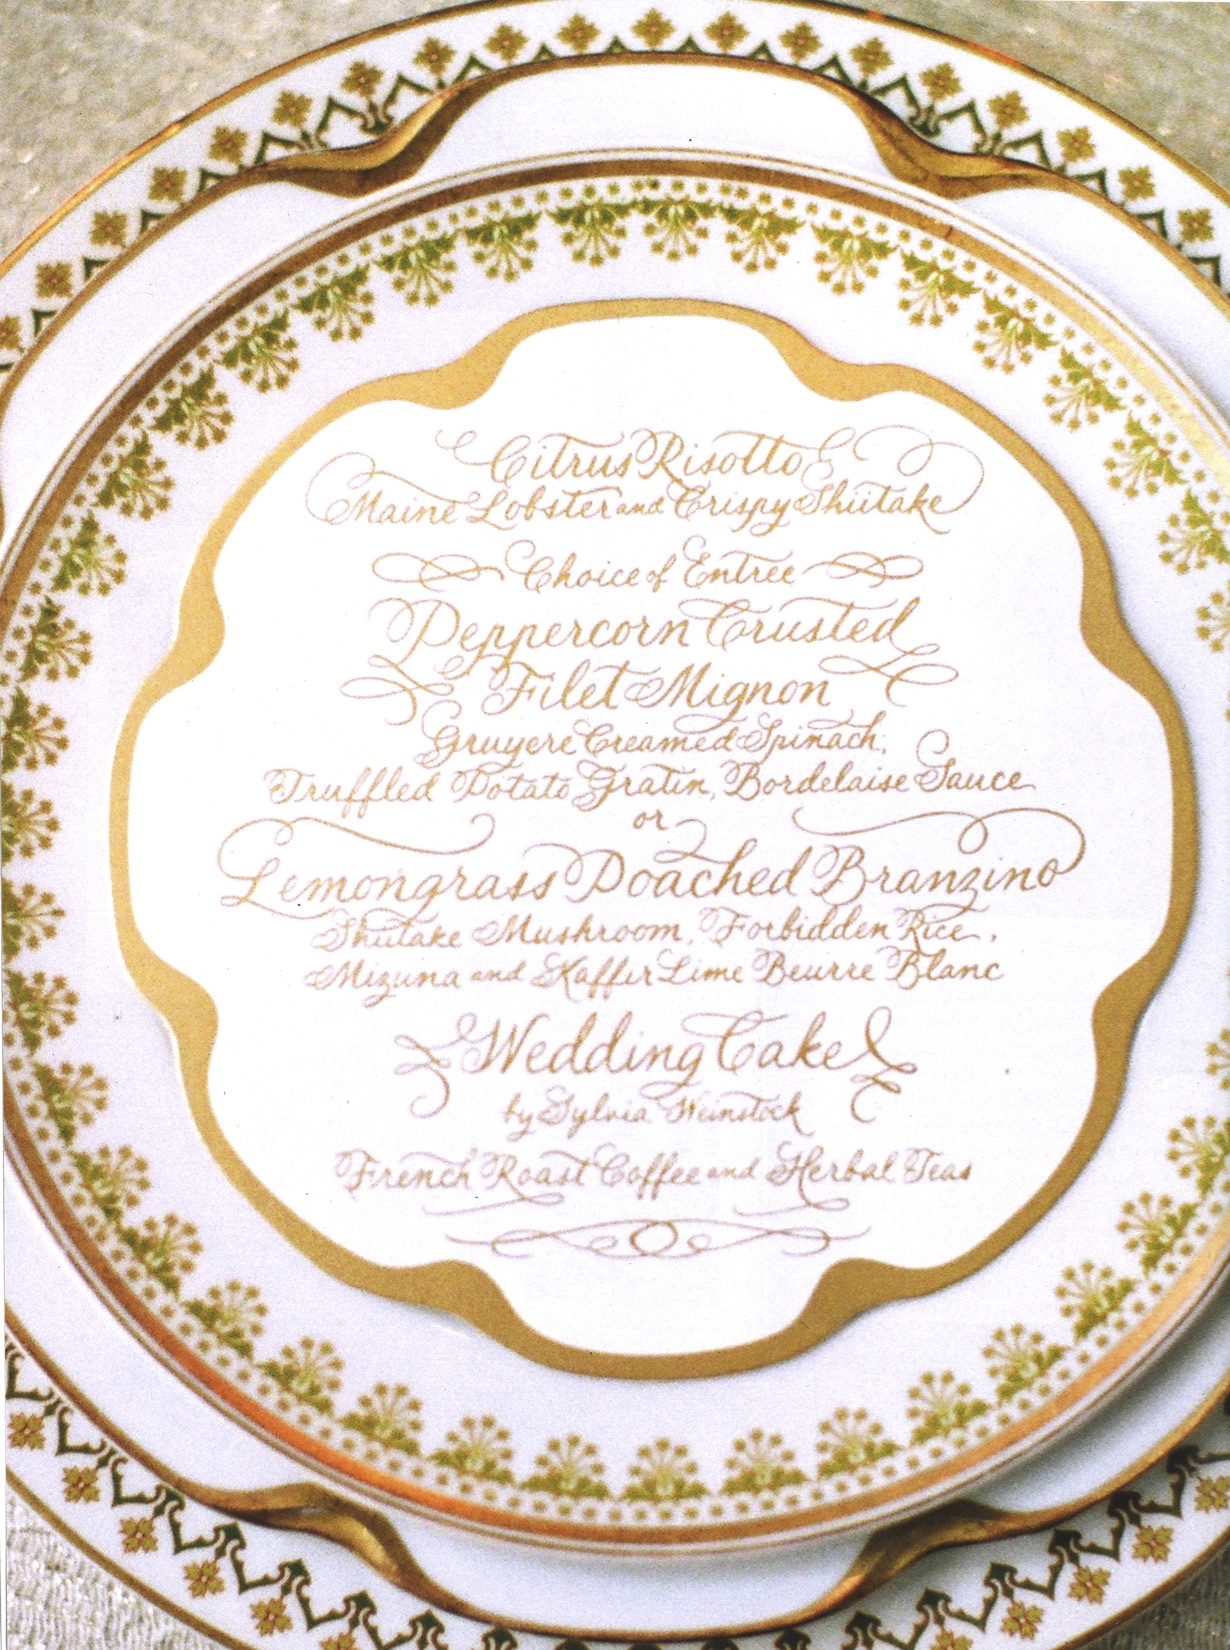 Weddings Matthew Robbins5.2017.jpg